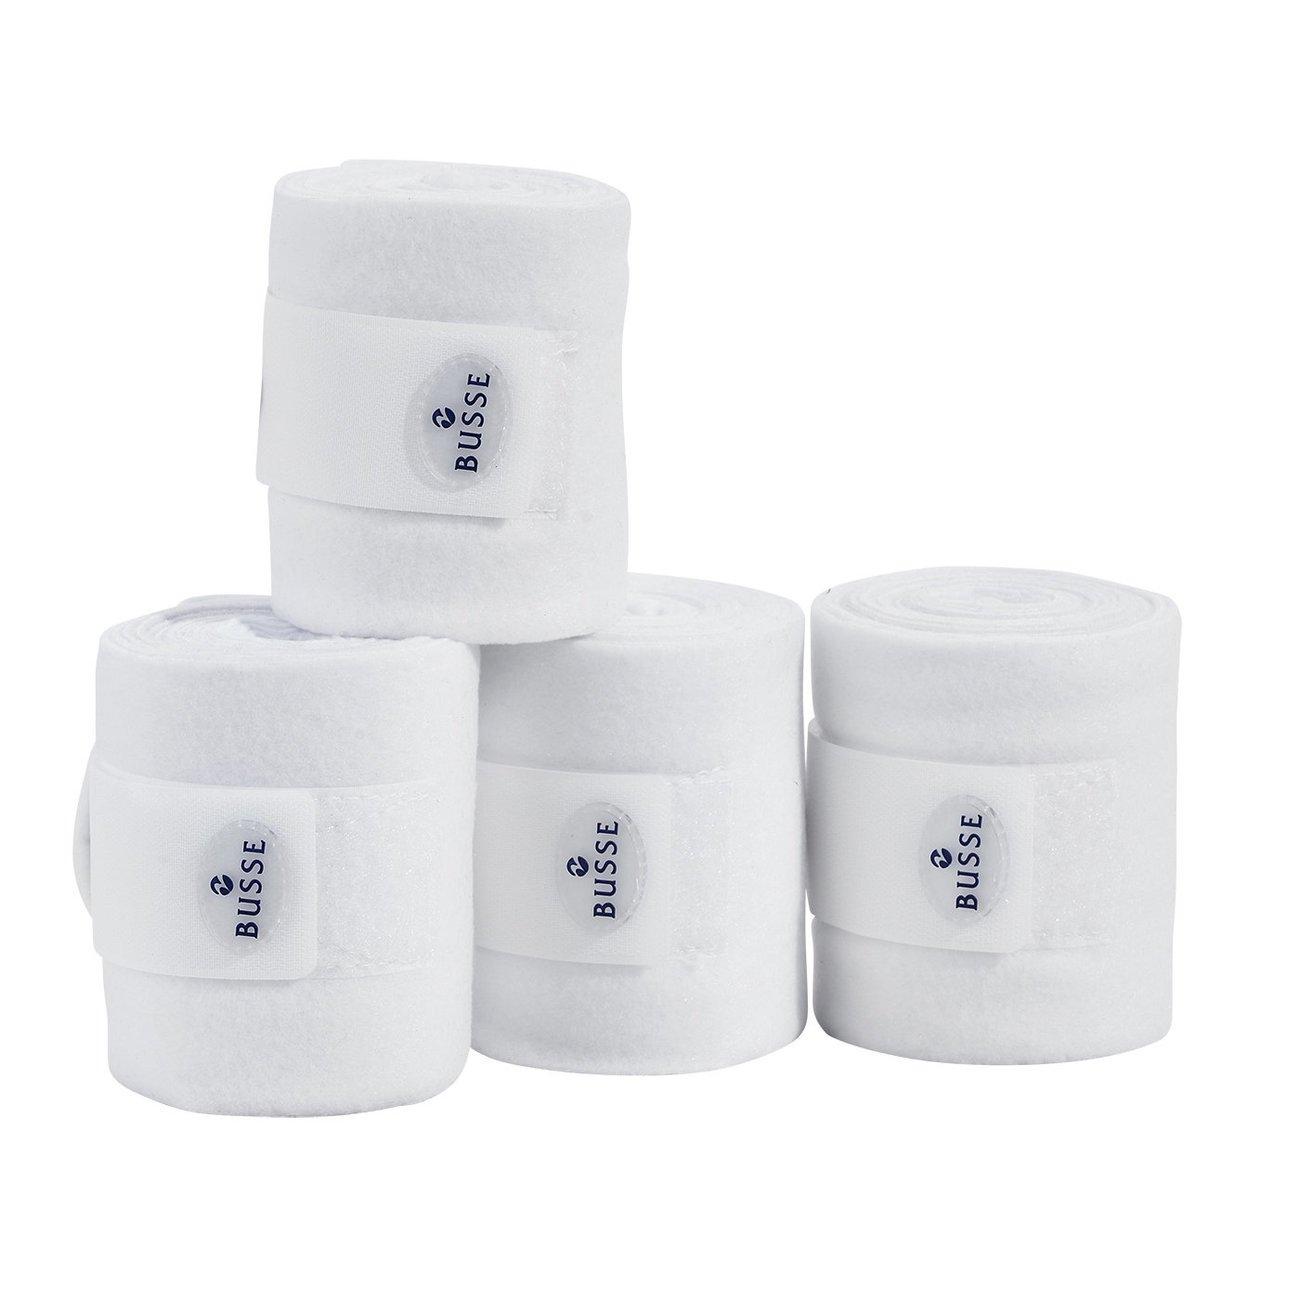 BUSSE Bandagen Fleece, Bild 3